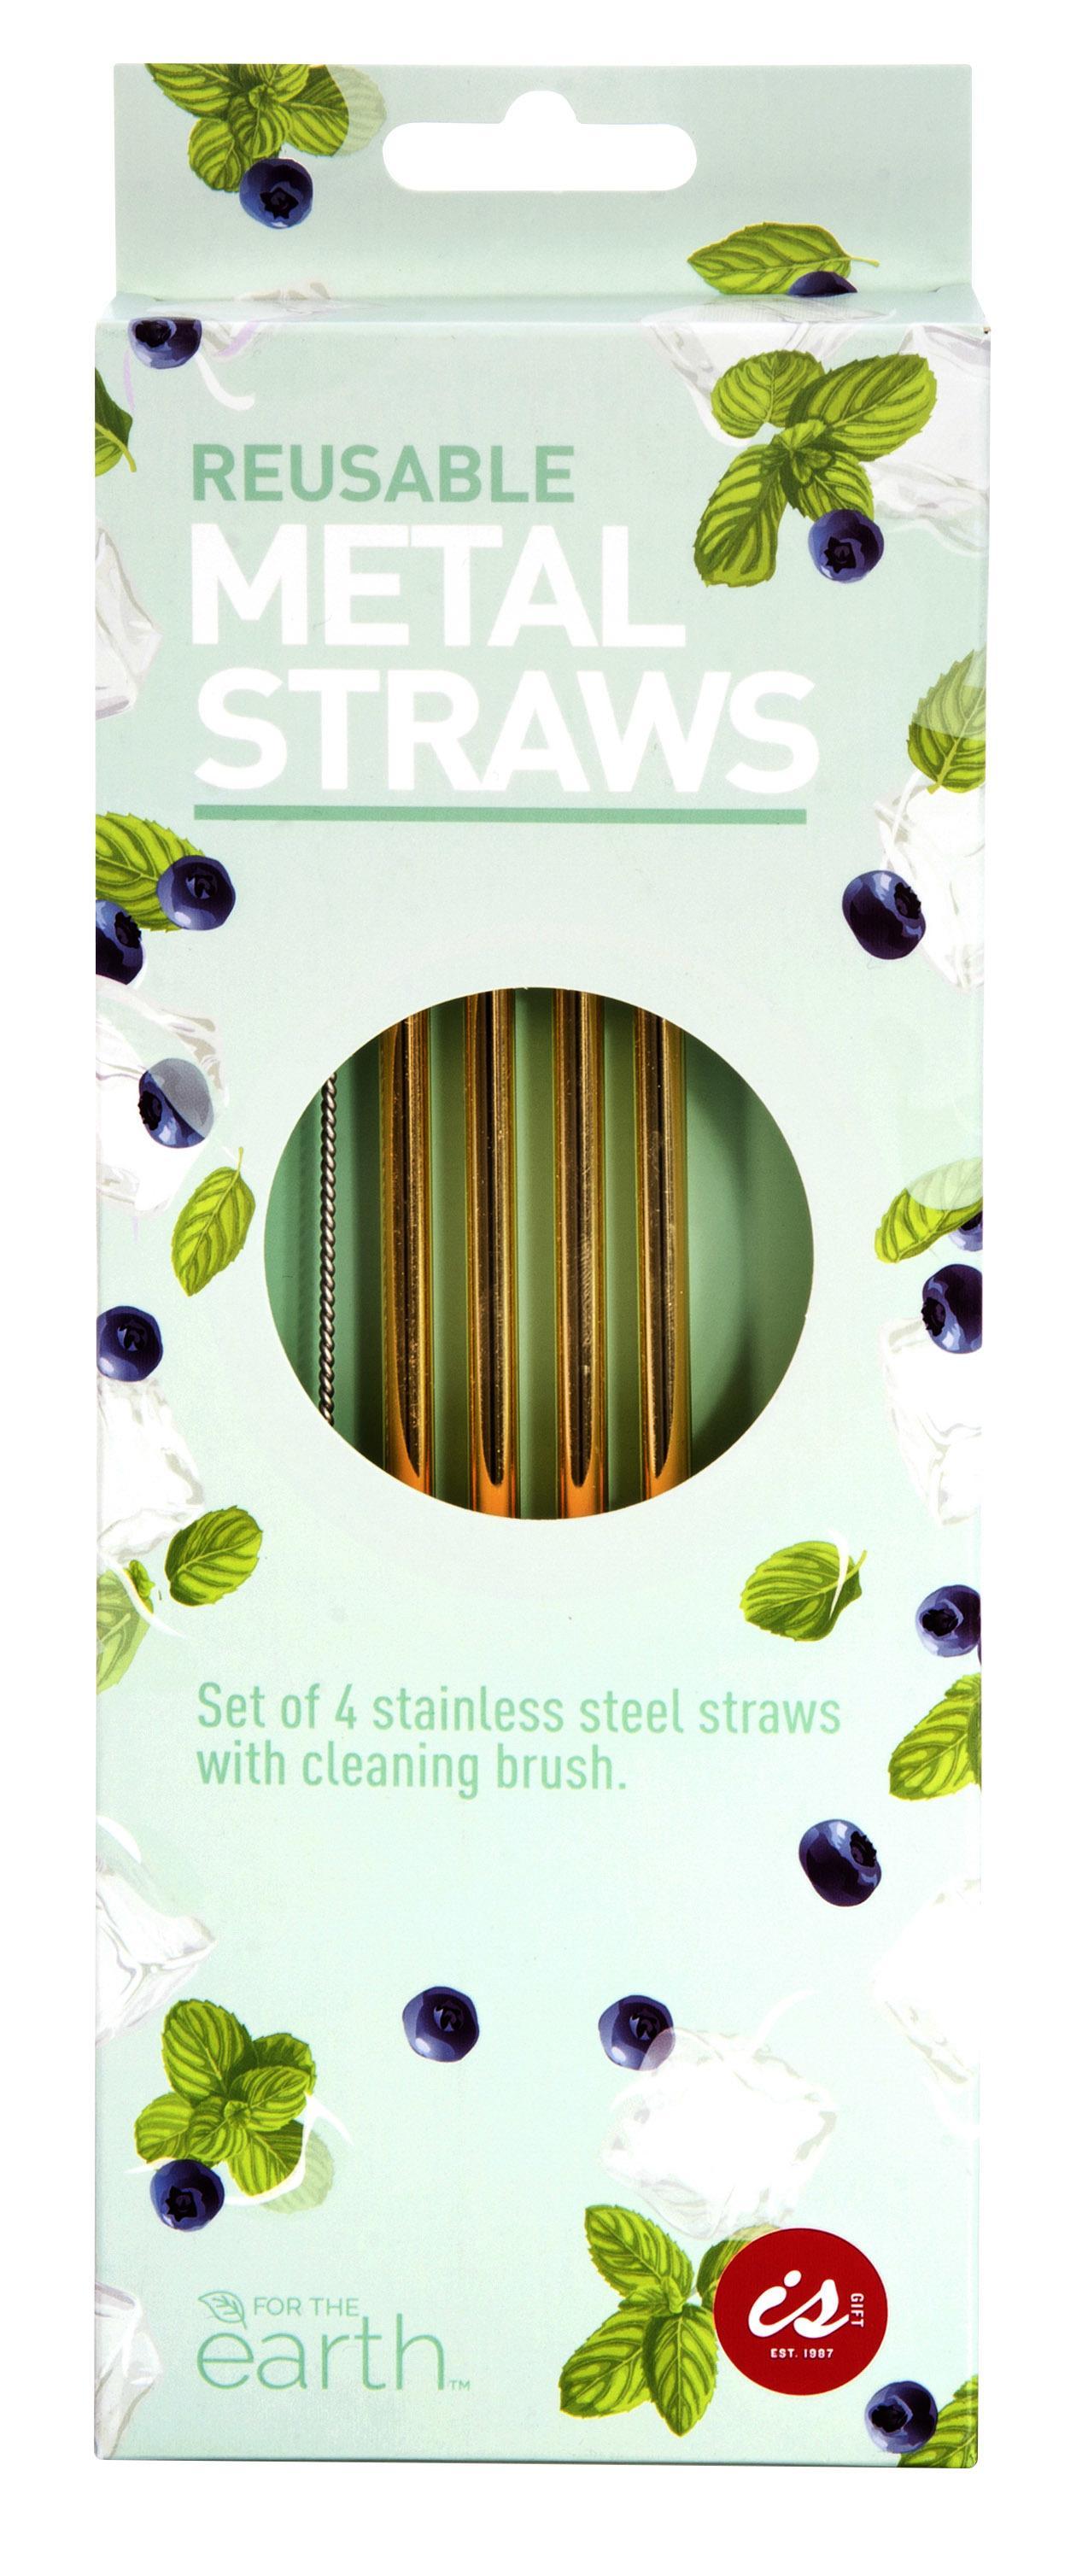 Reusable Metal Straws - MetallicsSet4